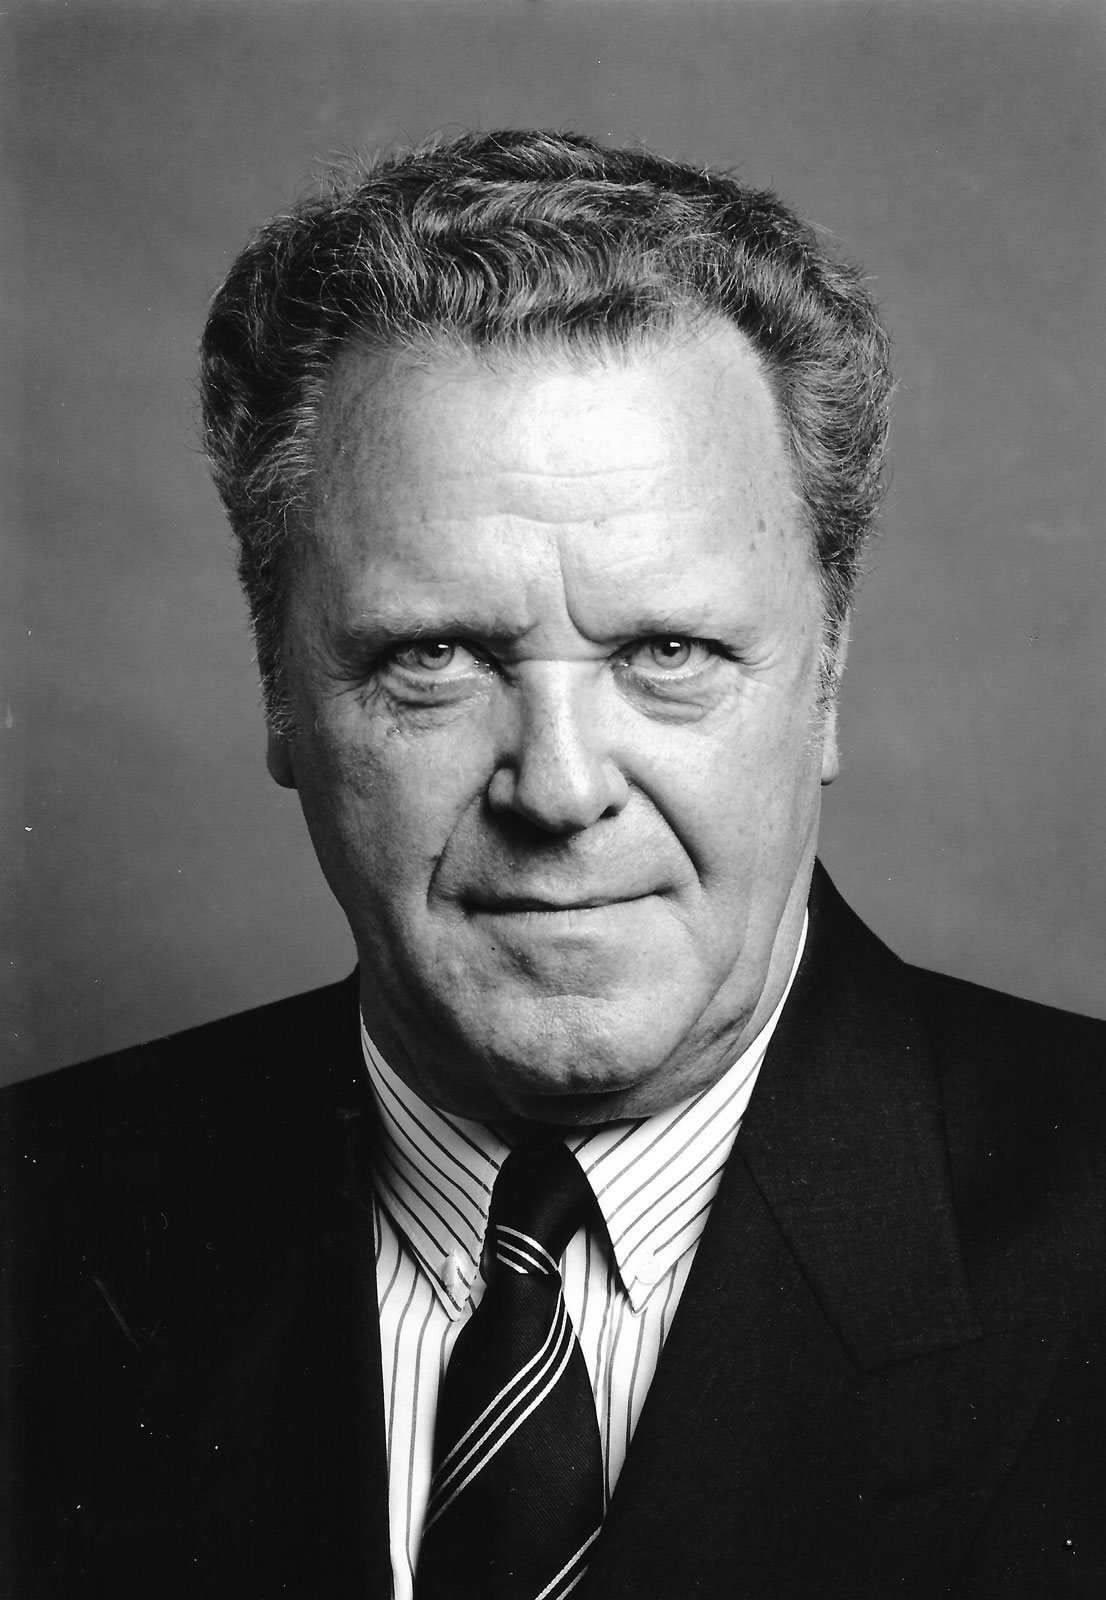 + Pfarrer i.R. Bruno Feß (1923-2020) (Foto: privat)